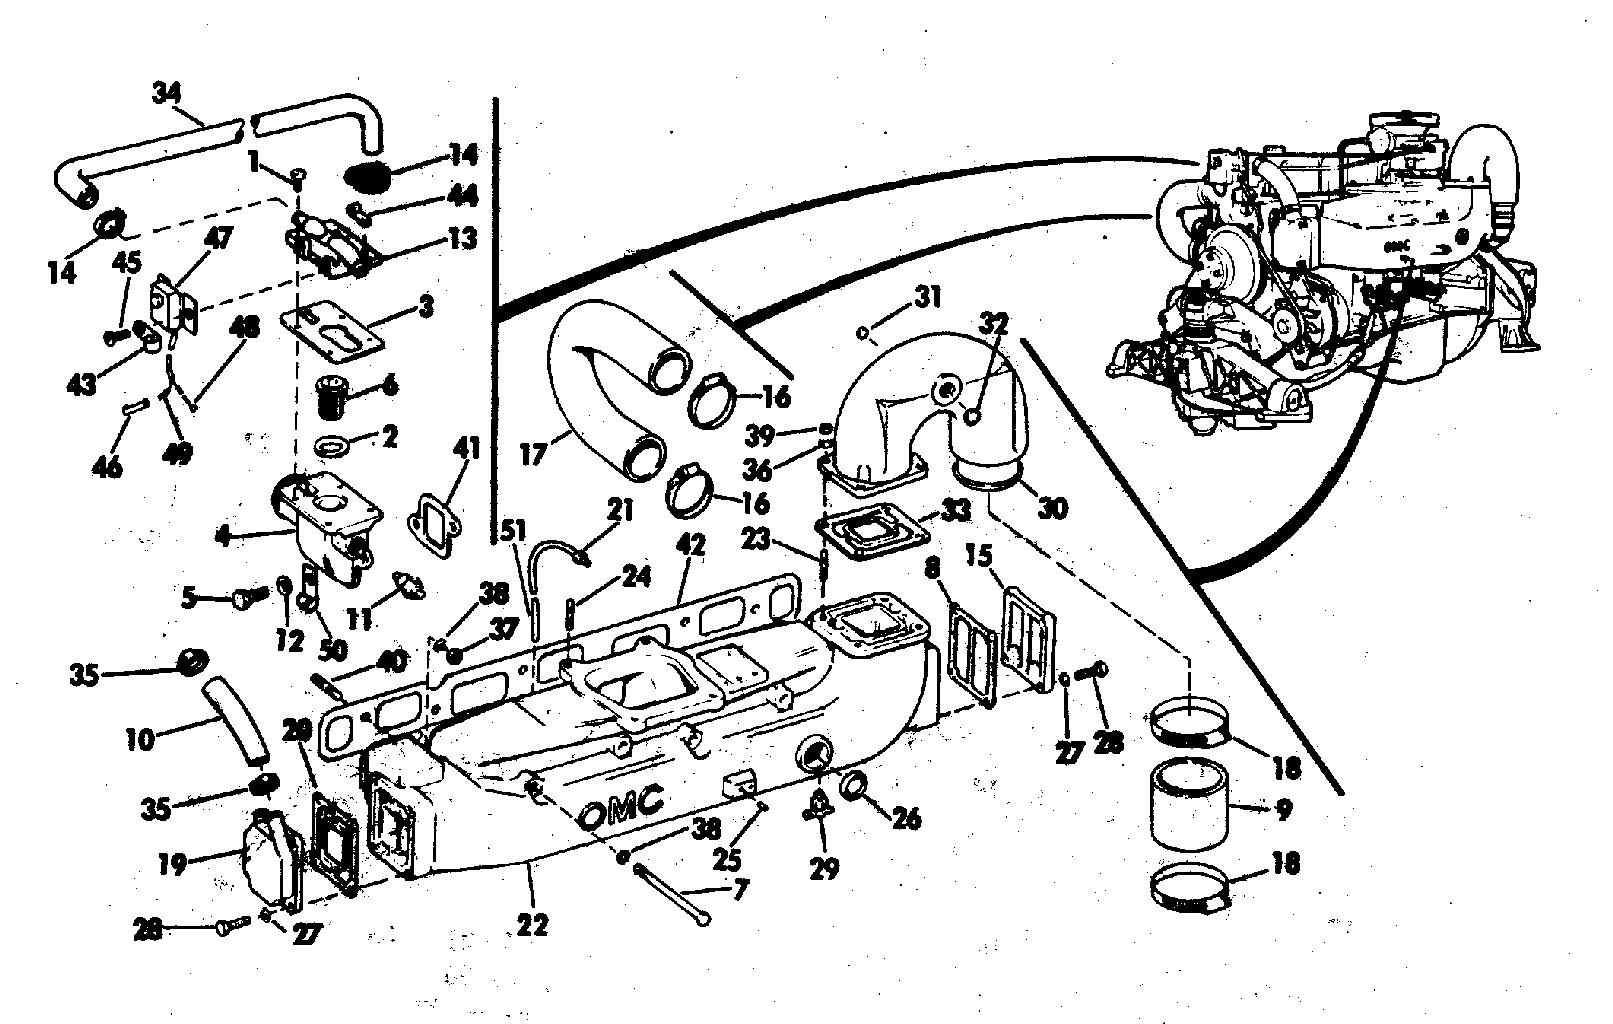 Array brp stern drive 1976 235 990241m 1976 cooling system group rh vansoutboardparts